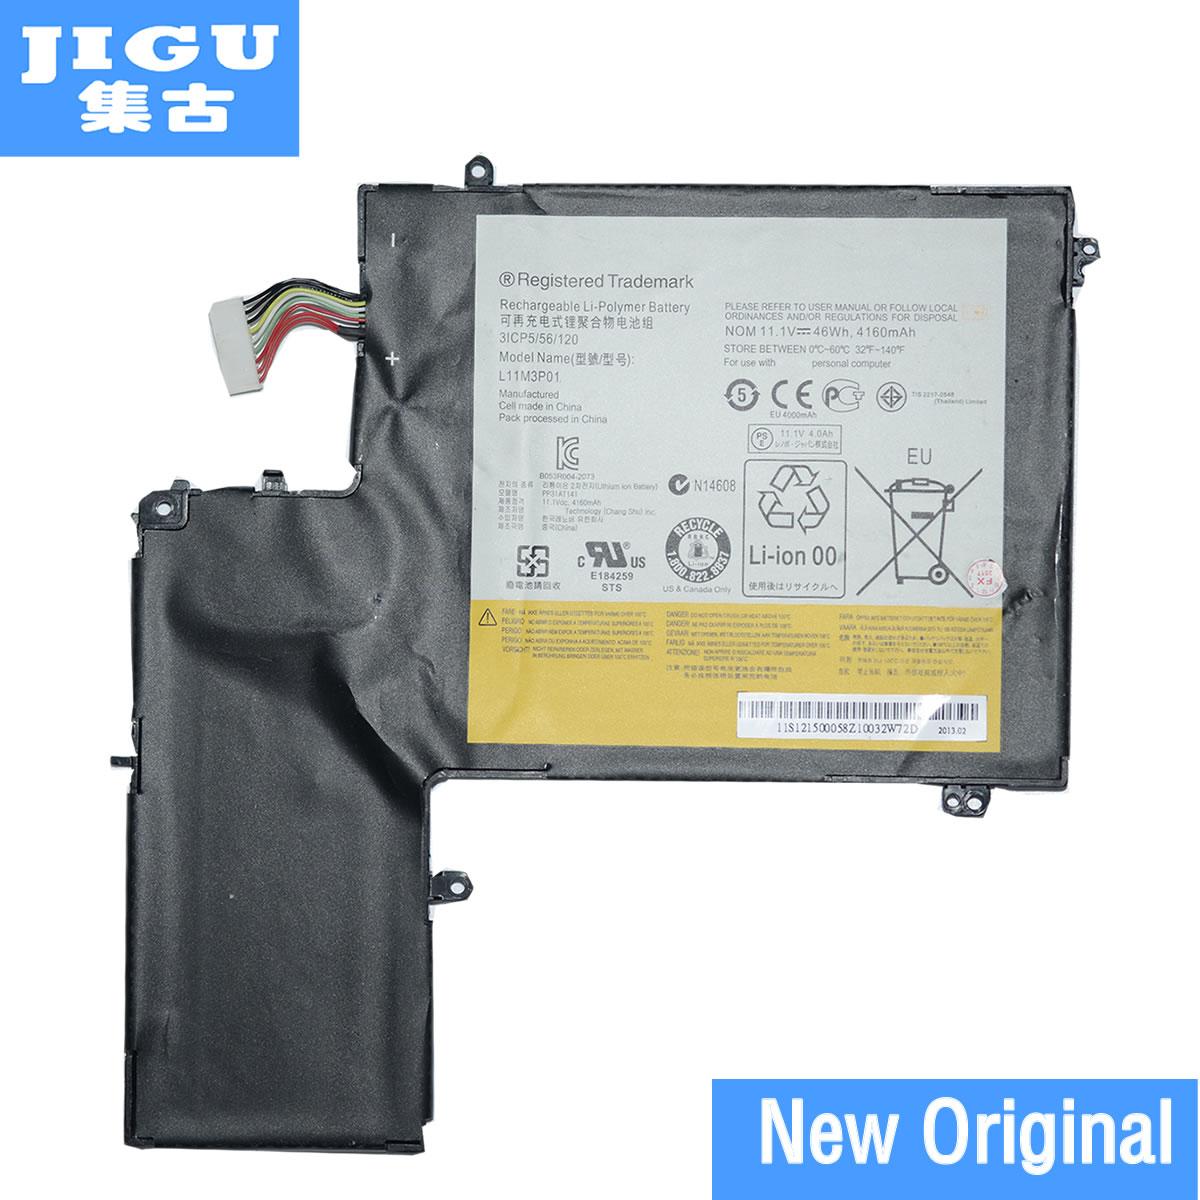 JIGU 3ICP5/56/120 L11M3P01 Original Laptop Battery For Lenovo For IdeaPad U310 11.1V 46WH